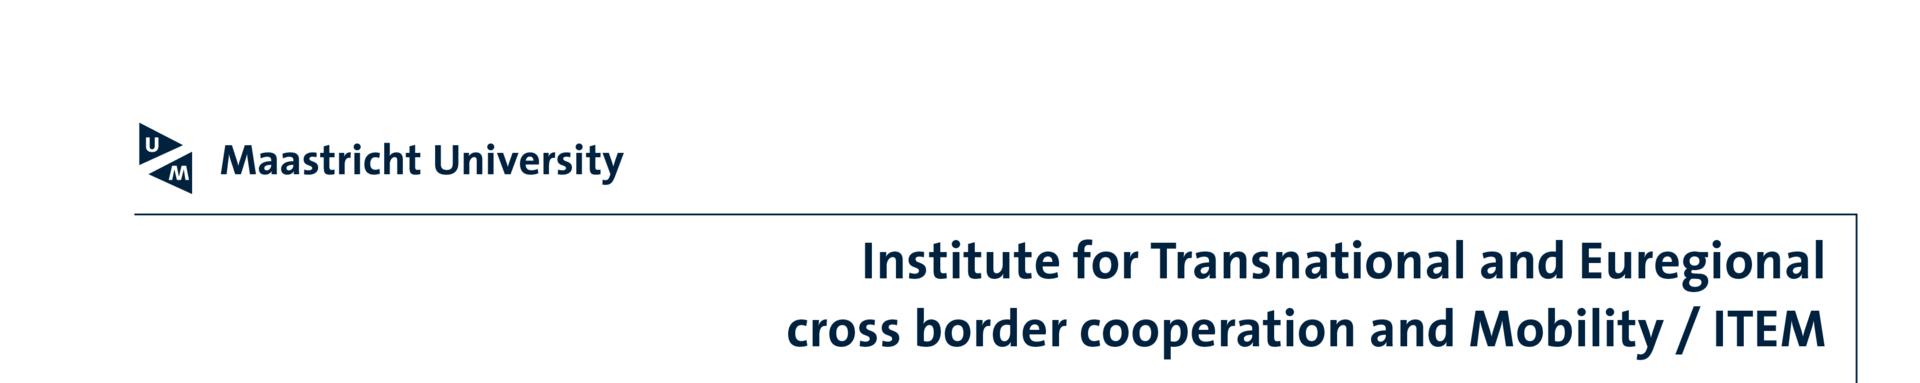 ITEM-Jahreskonferenz 10. November 2017